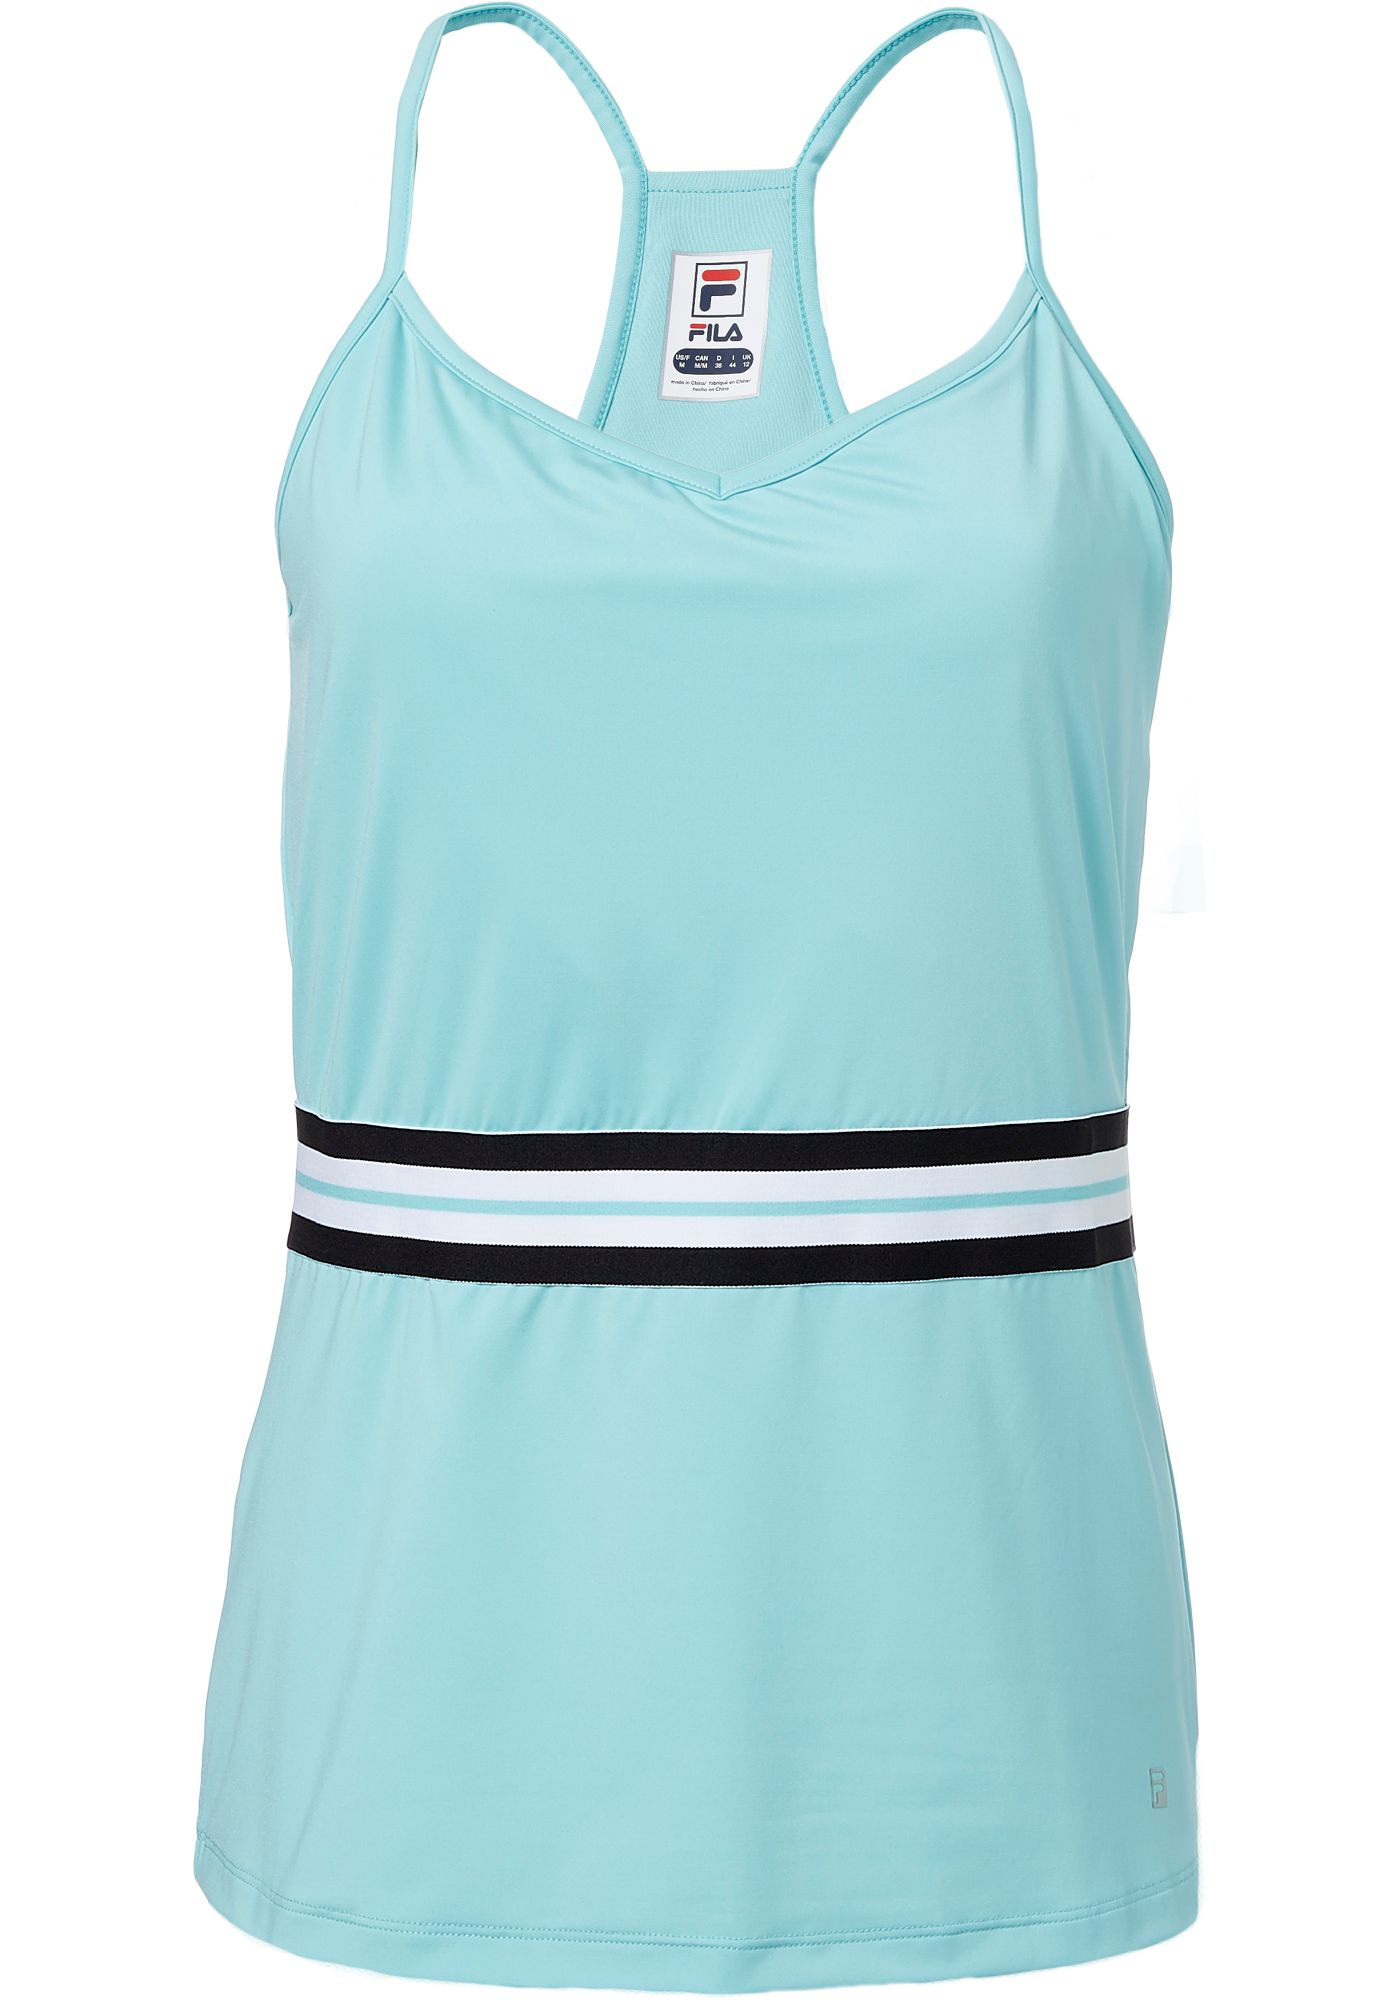 FILA Women's Love Game Cami Tennis Tank Top